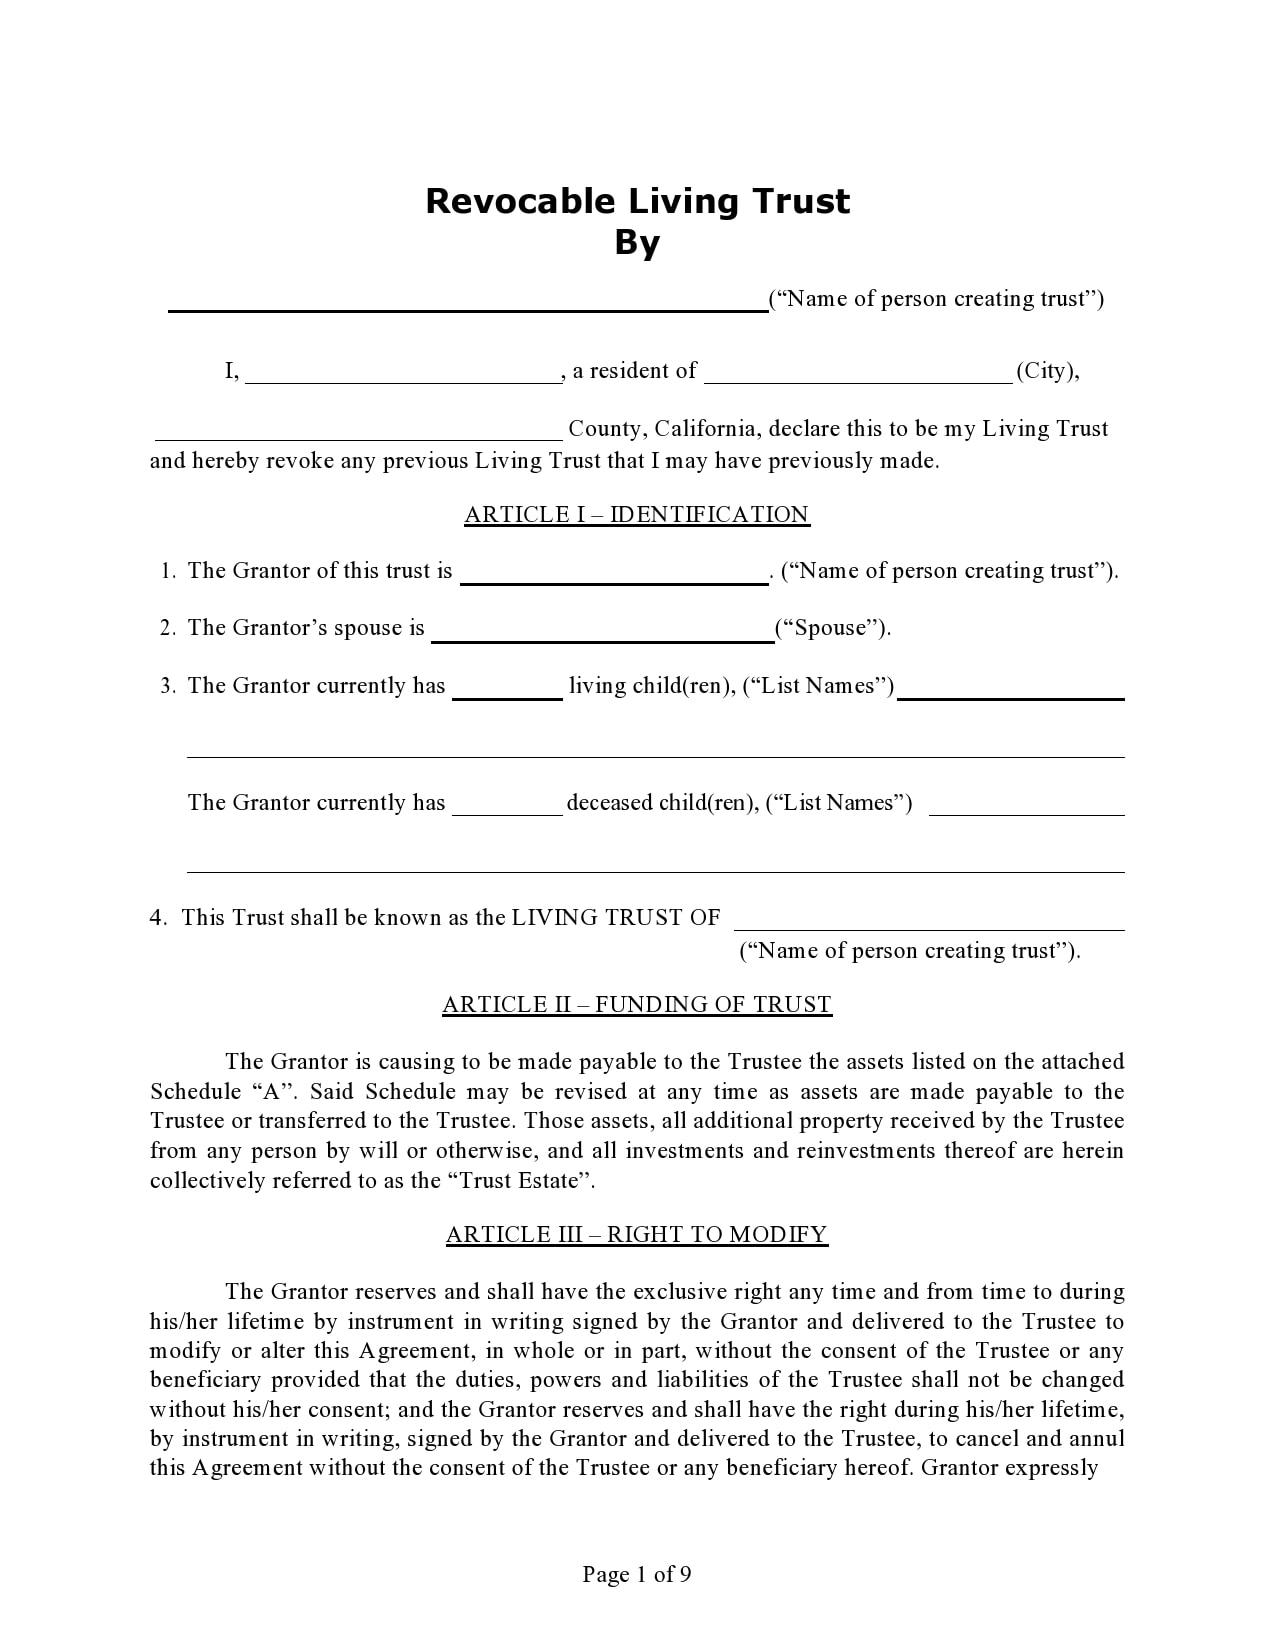 living trust form 14